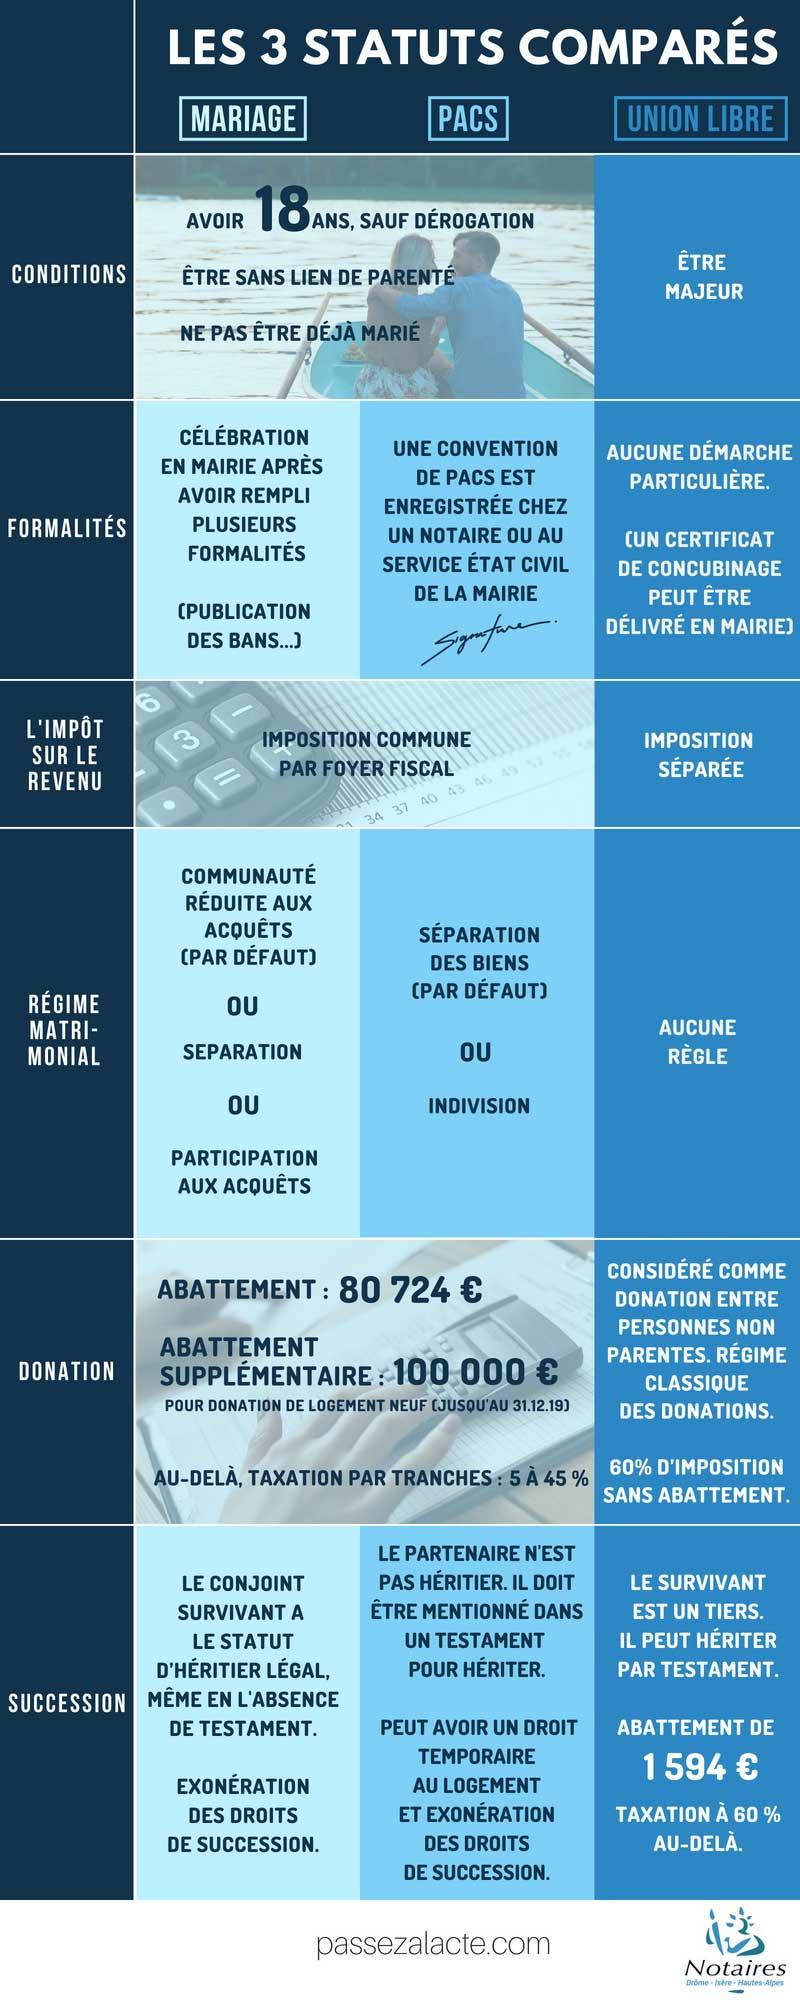 Comparatif Album Photo En Ligne 2019 : comparatif, album, photo, ligne, Limited, Deals·comparatif, Liste, Mariage, 2018,OFF, 73%,nalan.com.sg